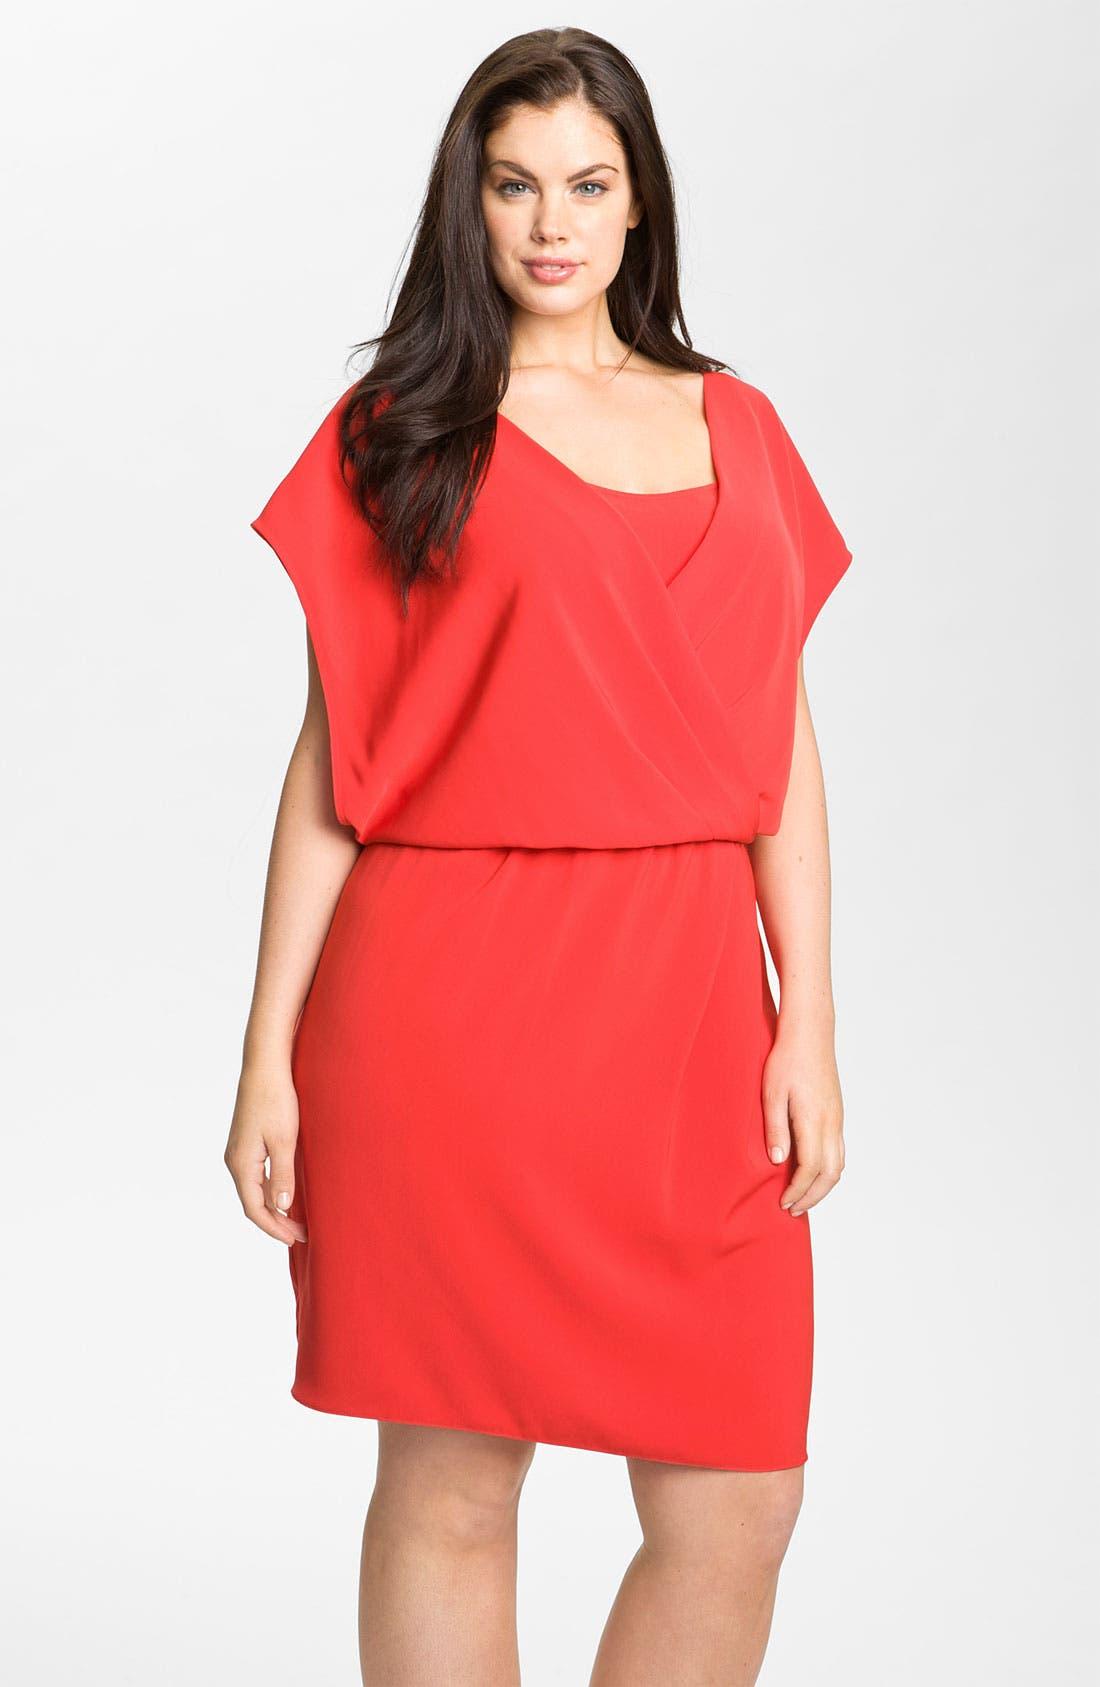 Alternate Image 1 Selected - DKNYC Cap Sleeve Blouson Knit Dress (Plus)